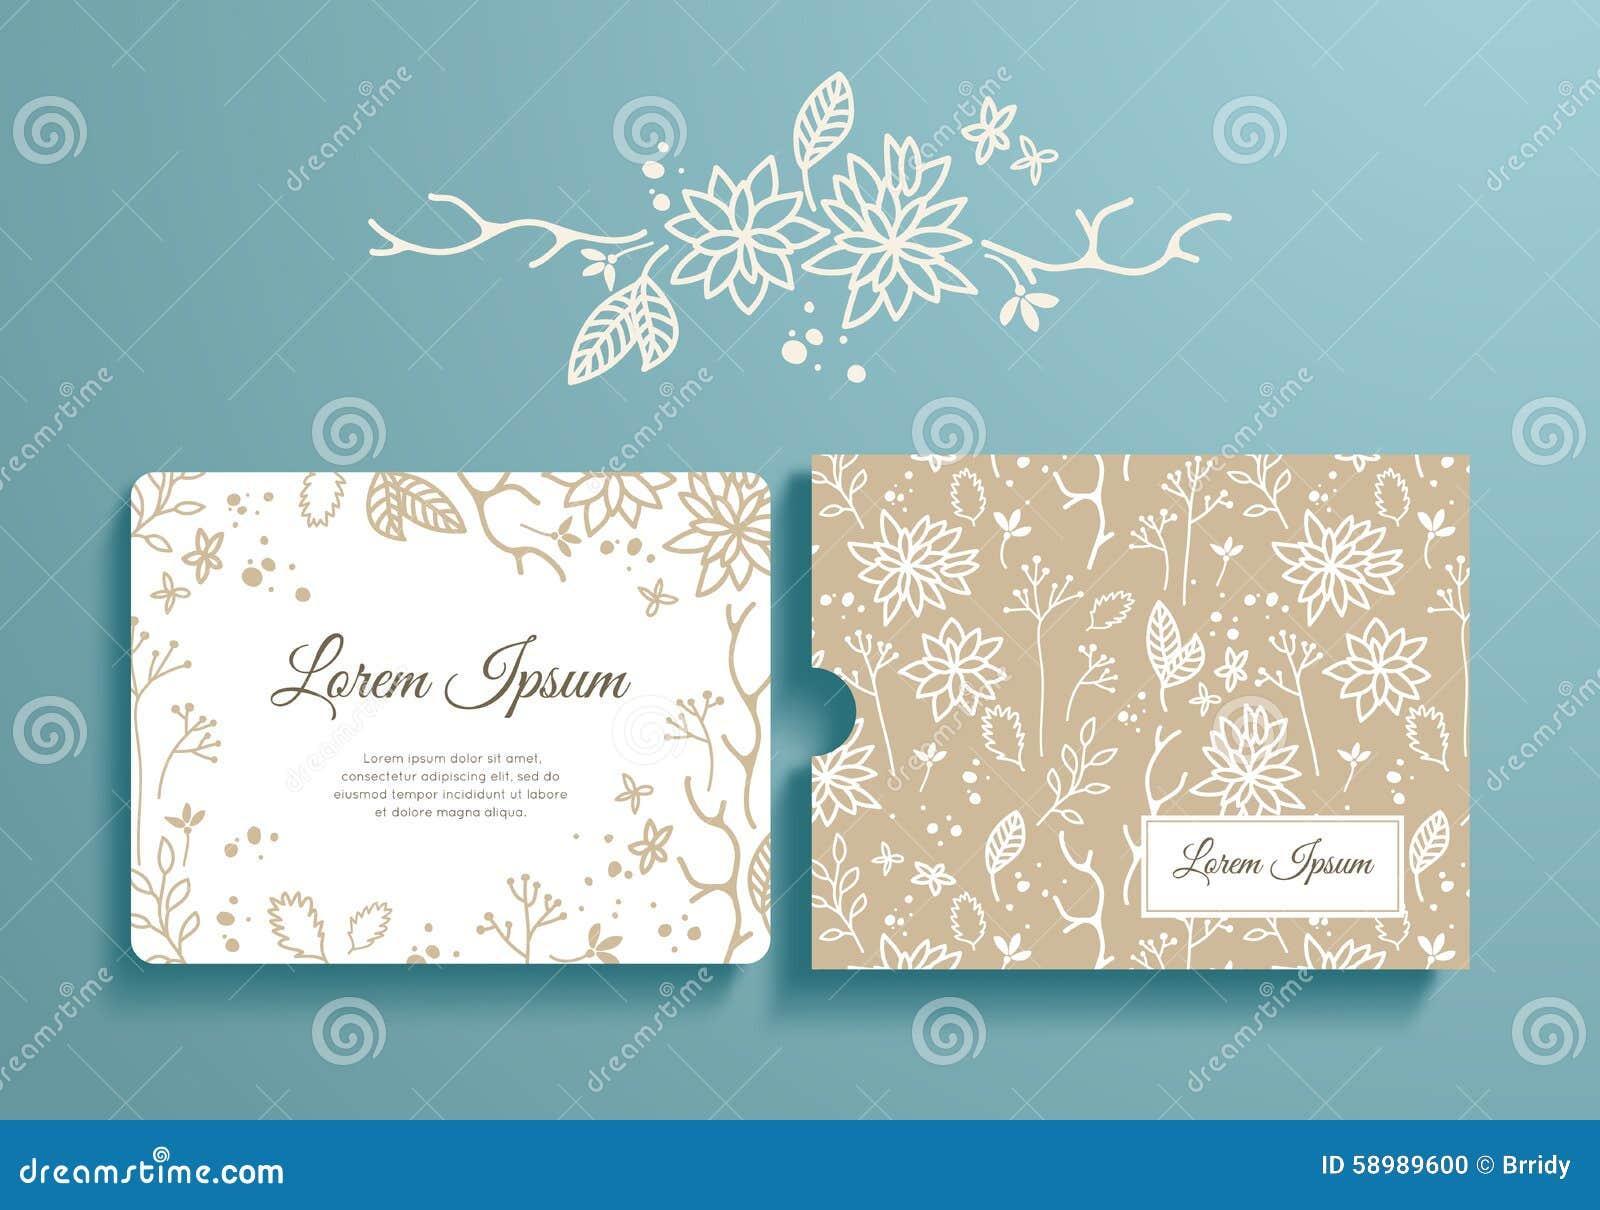 floral set of romantic invitation and envelope stock vector image 58989600. Black Bedroom Furniture Sets. Home Design Ideas